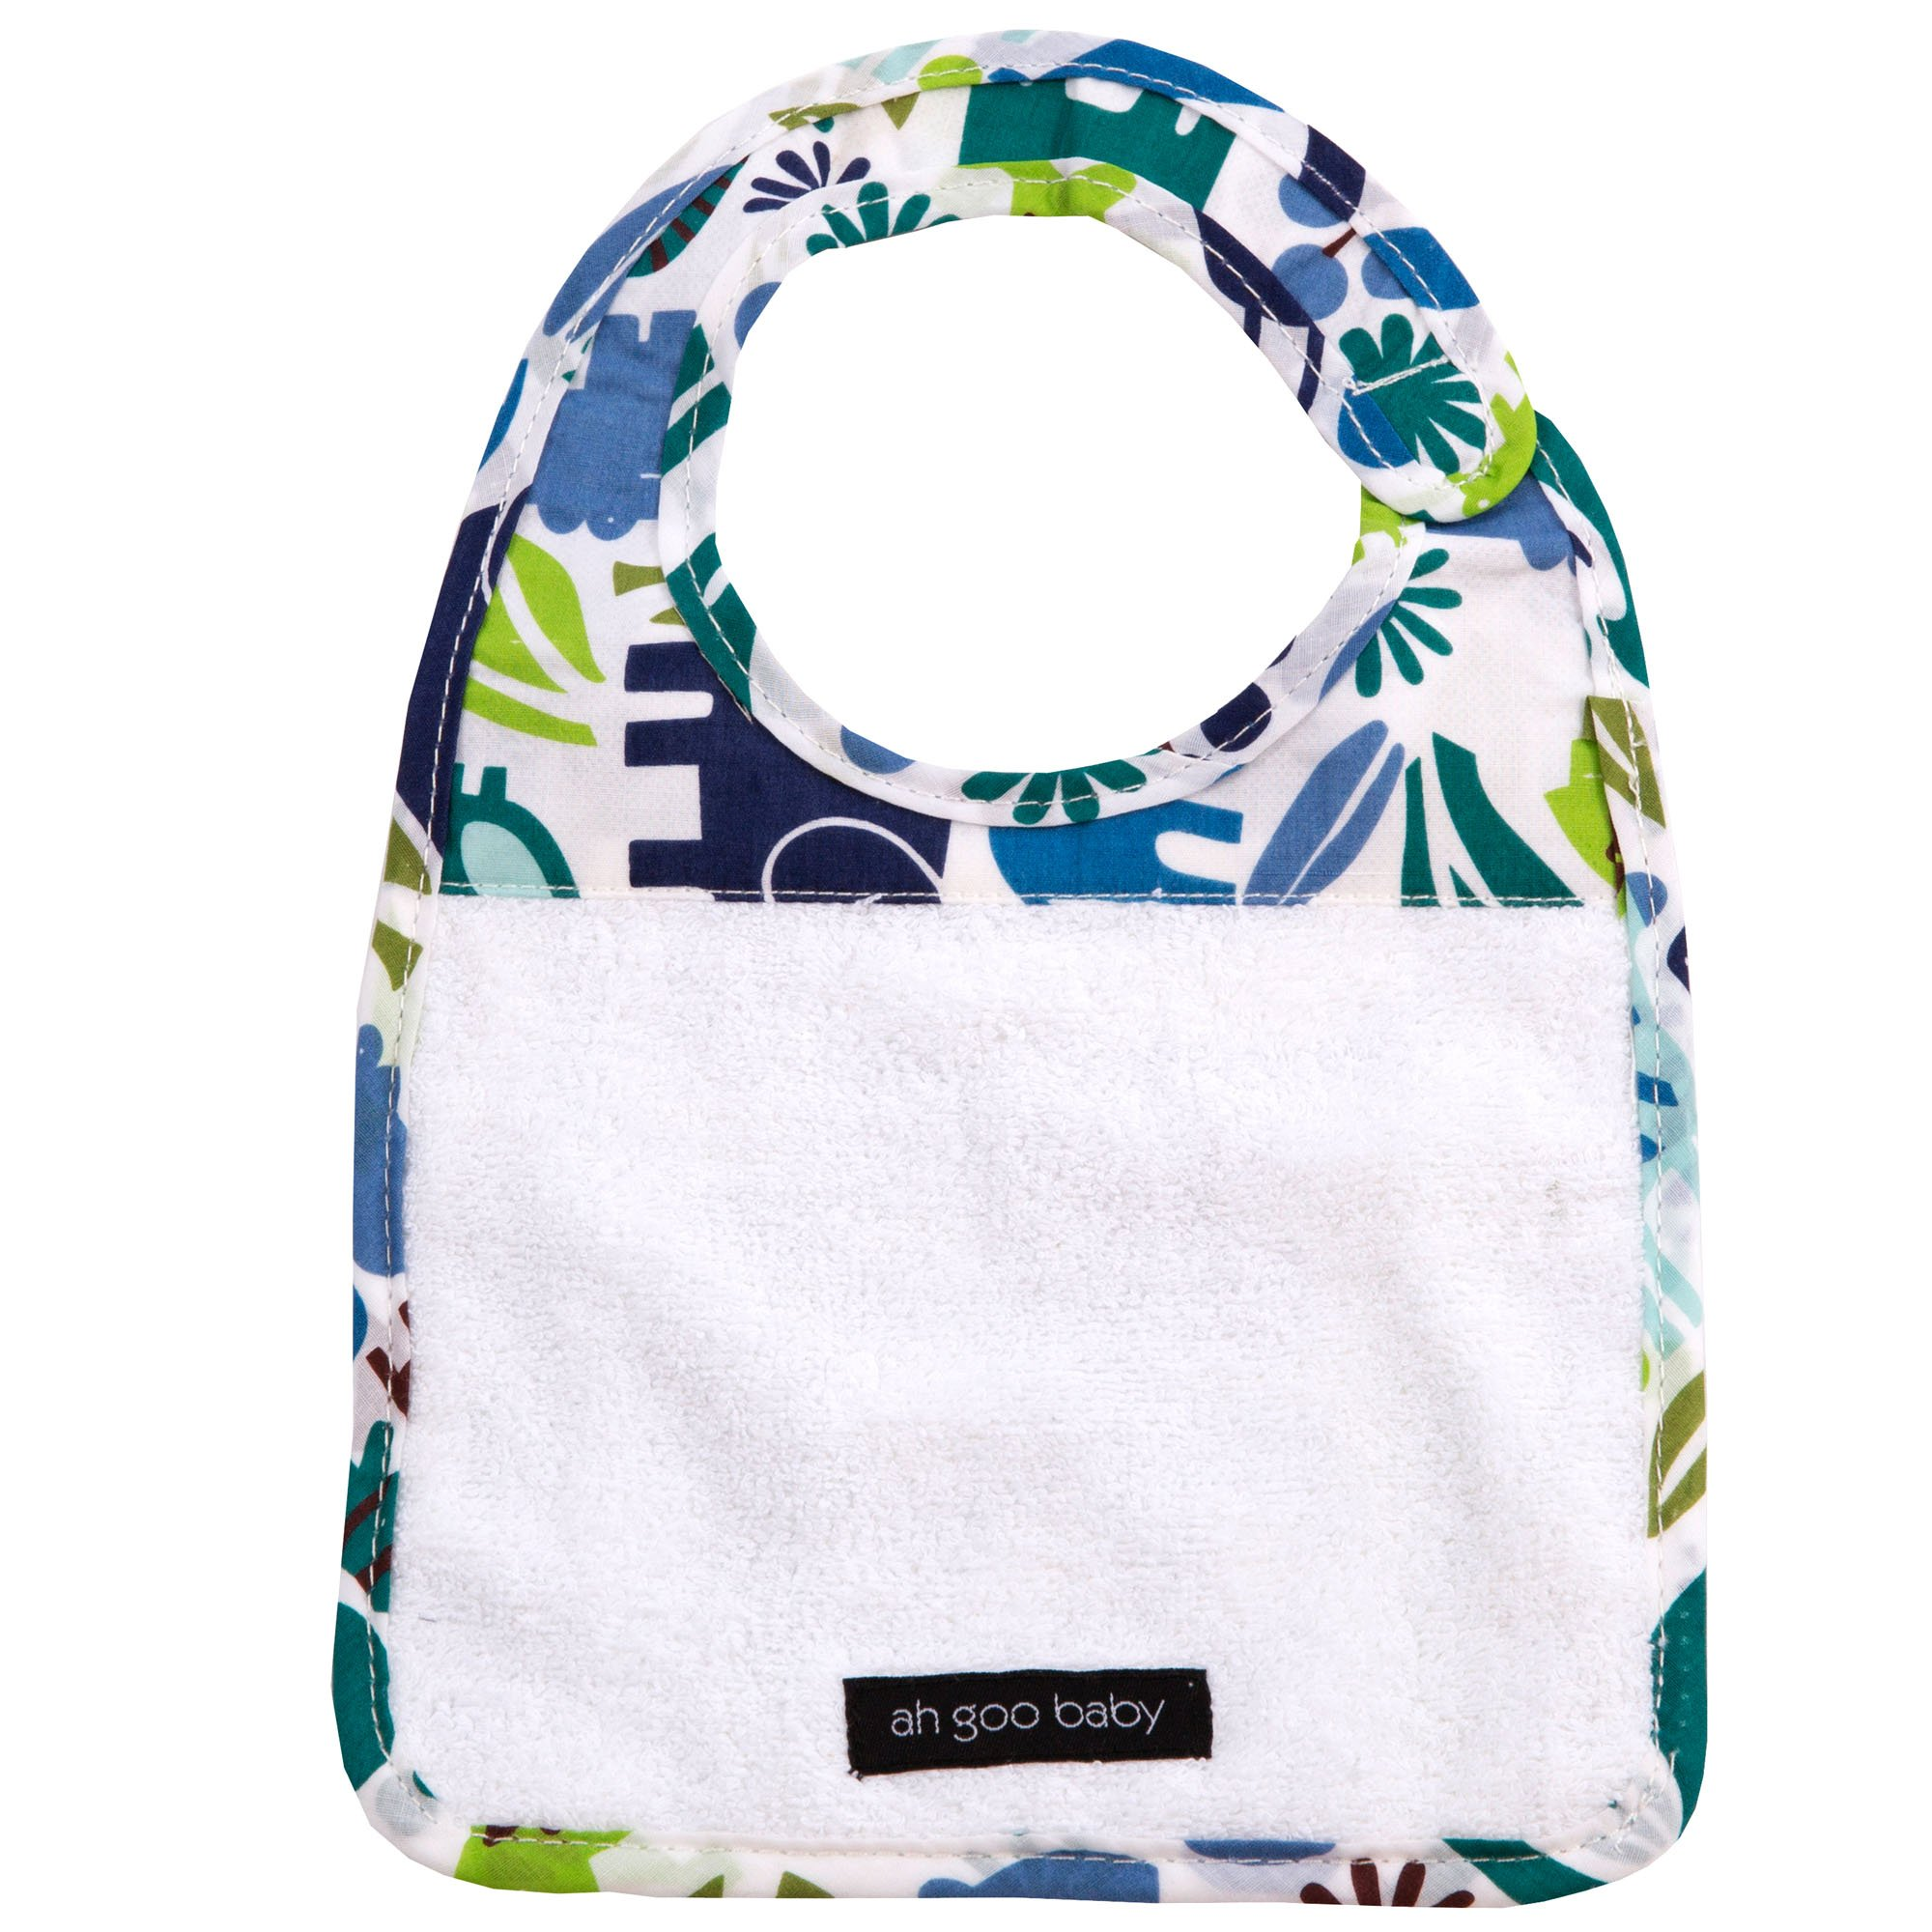 Ah Goo Baby Bib, 100% Cotton Terry Cloth, Wrap Around Collar, Zoo Frenzy Pattern